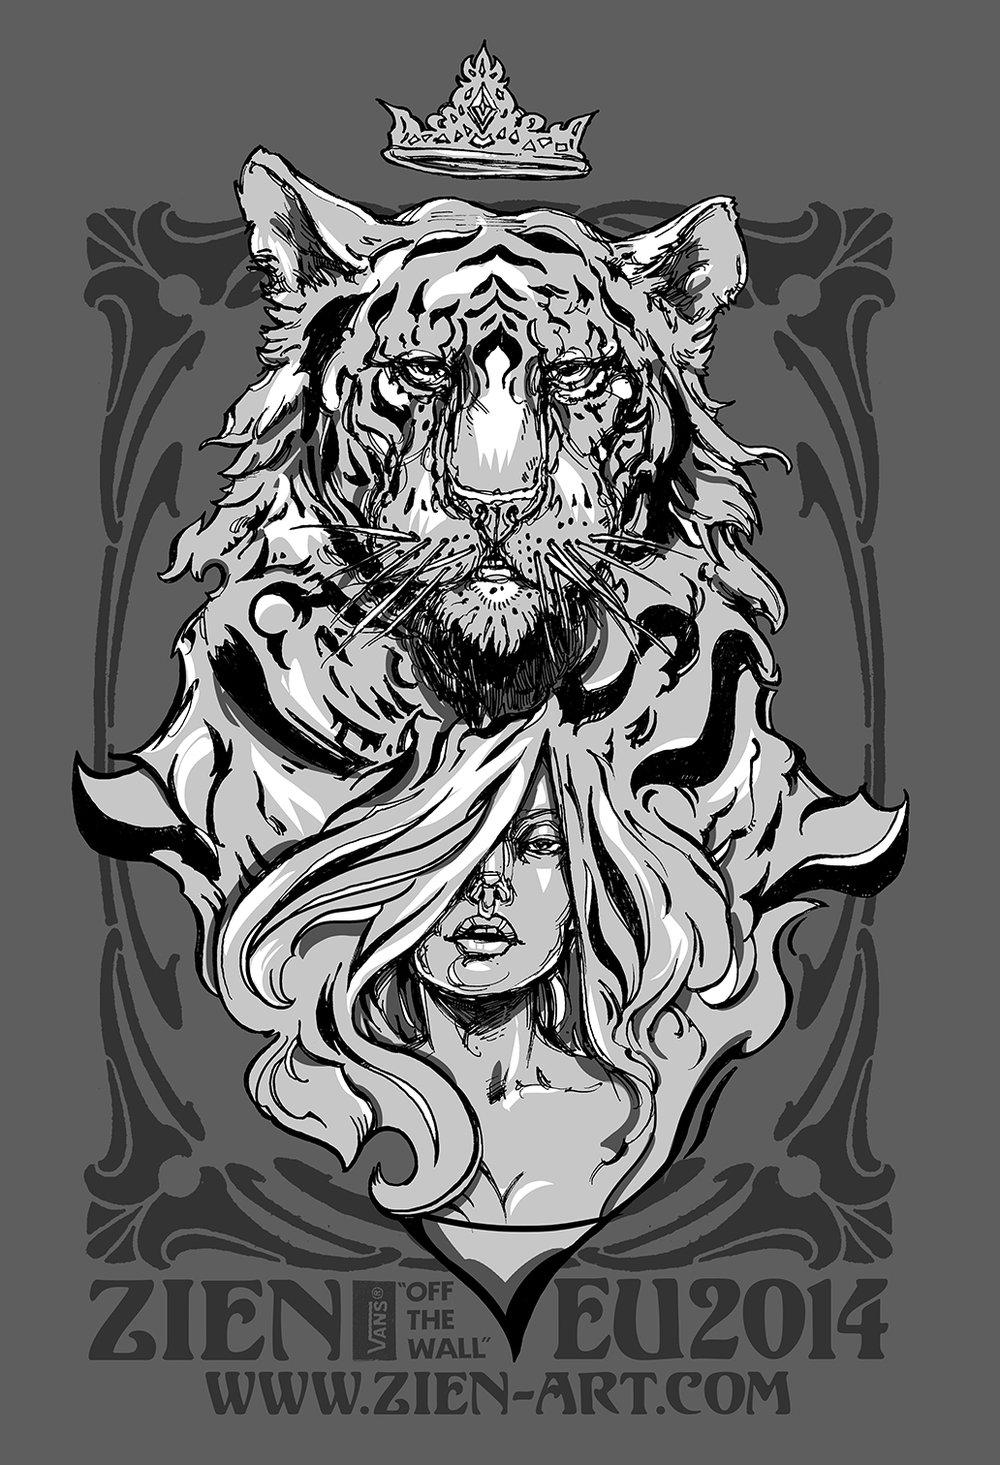 white_tiger007.jpg